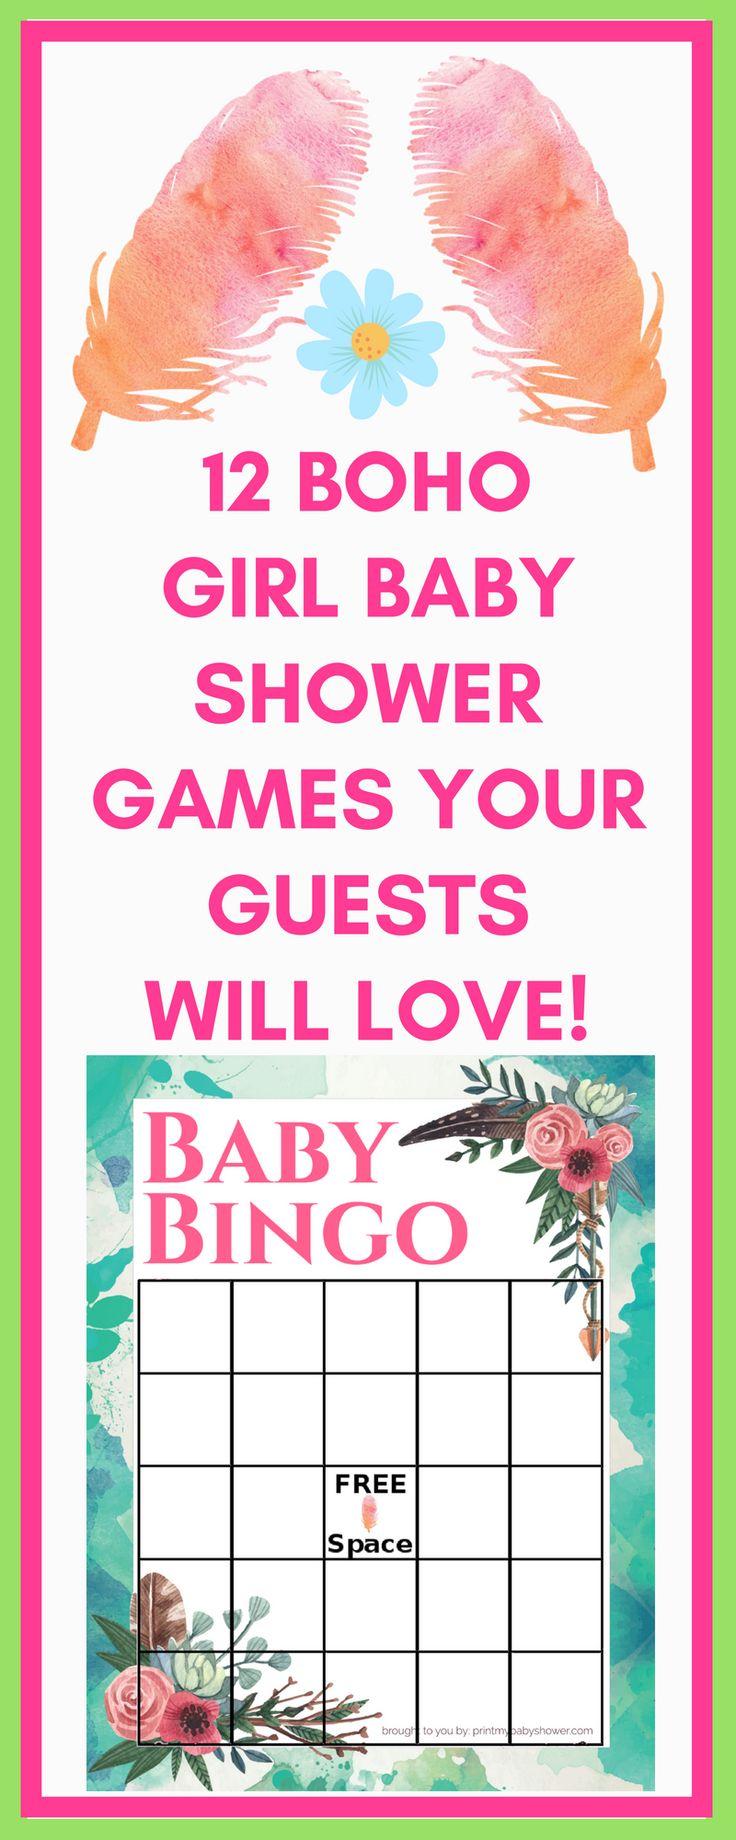 Boho Baby Shower Printable Games